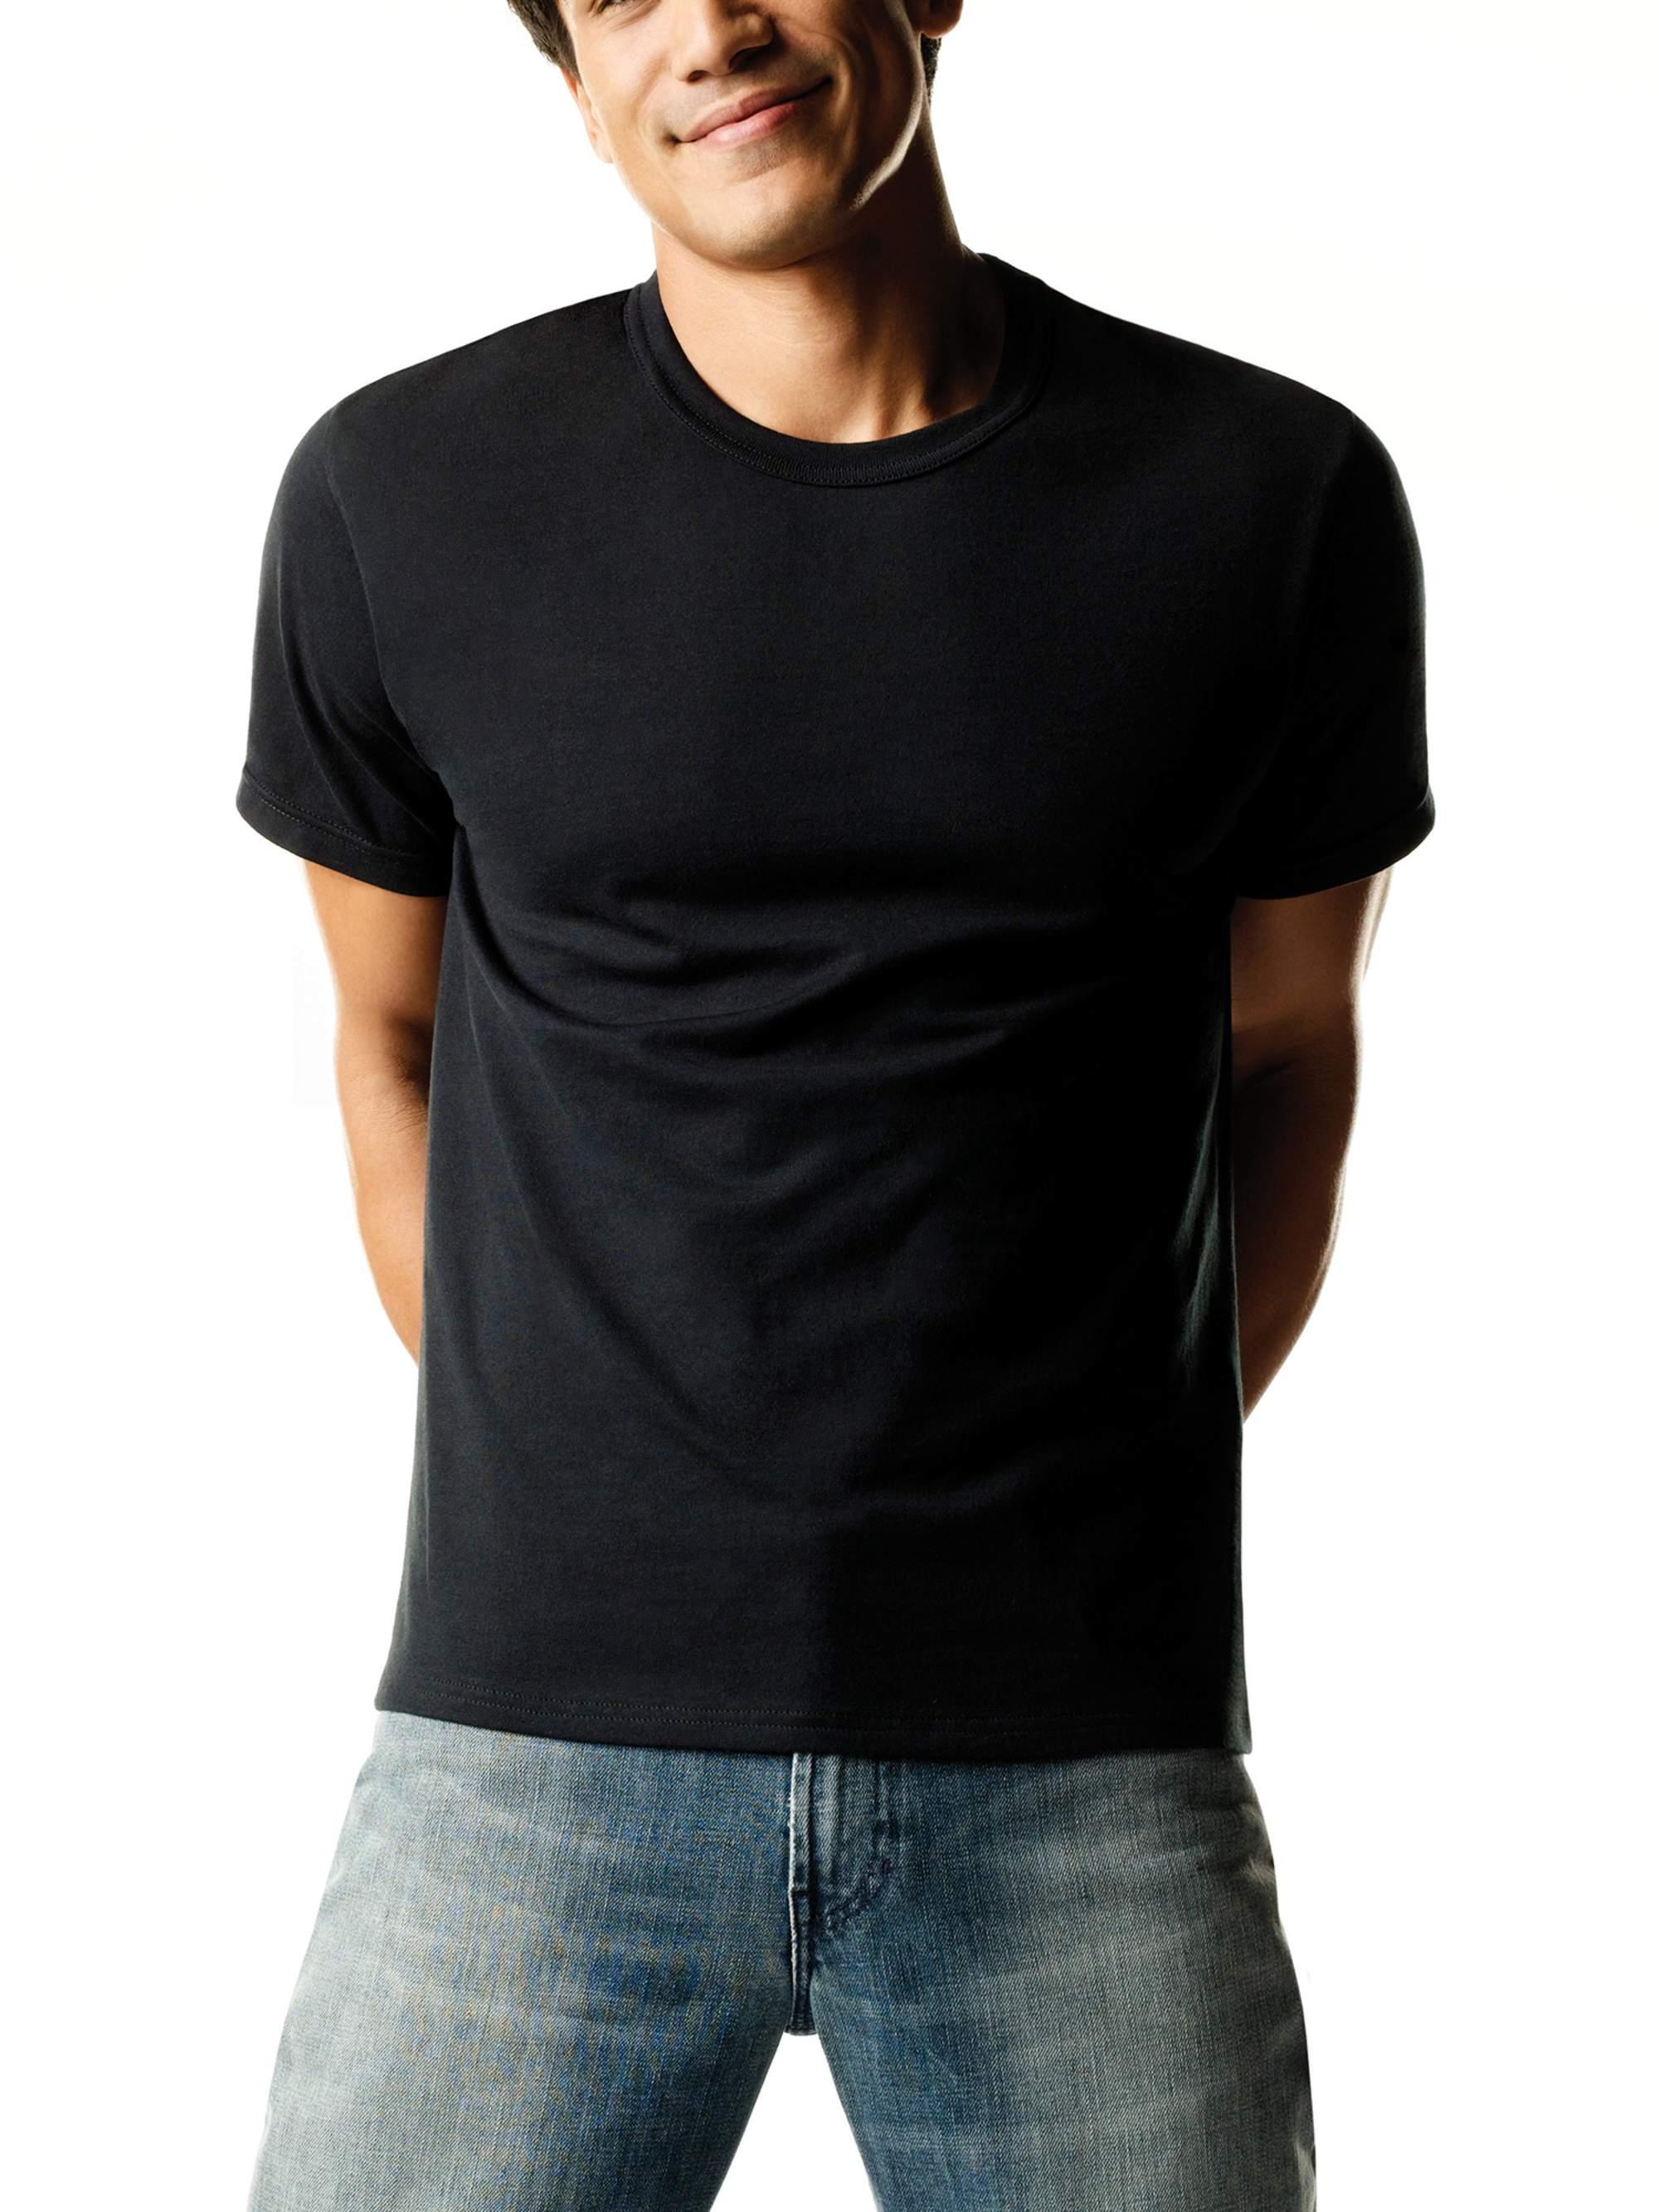 Men's FreshIQ ComfortSoft 4-Pack, Dyed Crew Neck T-Shirts